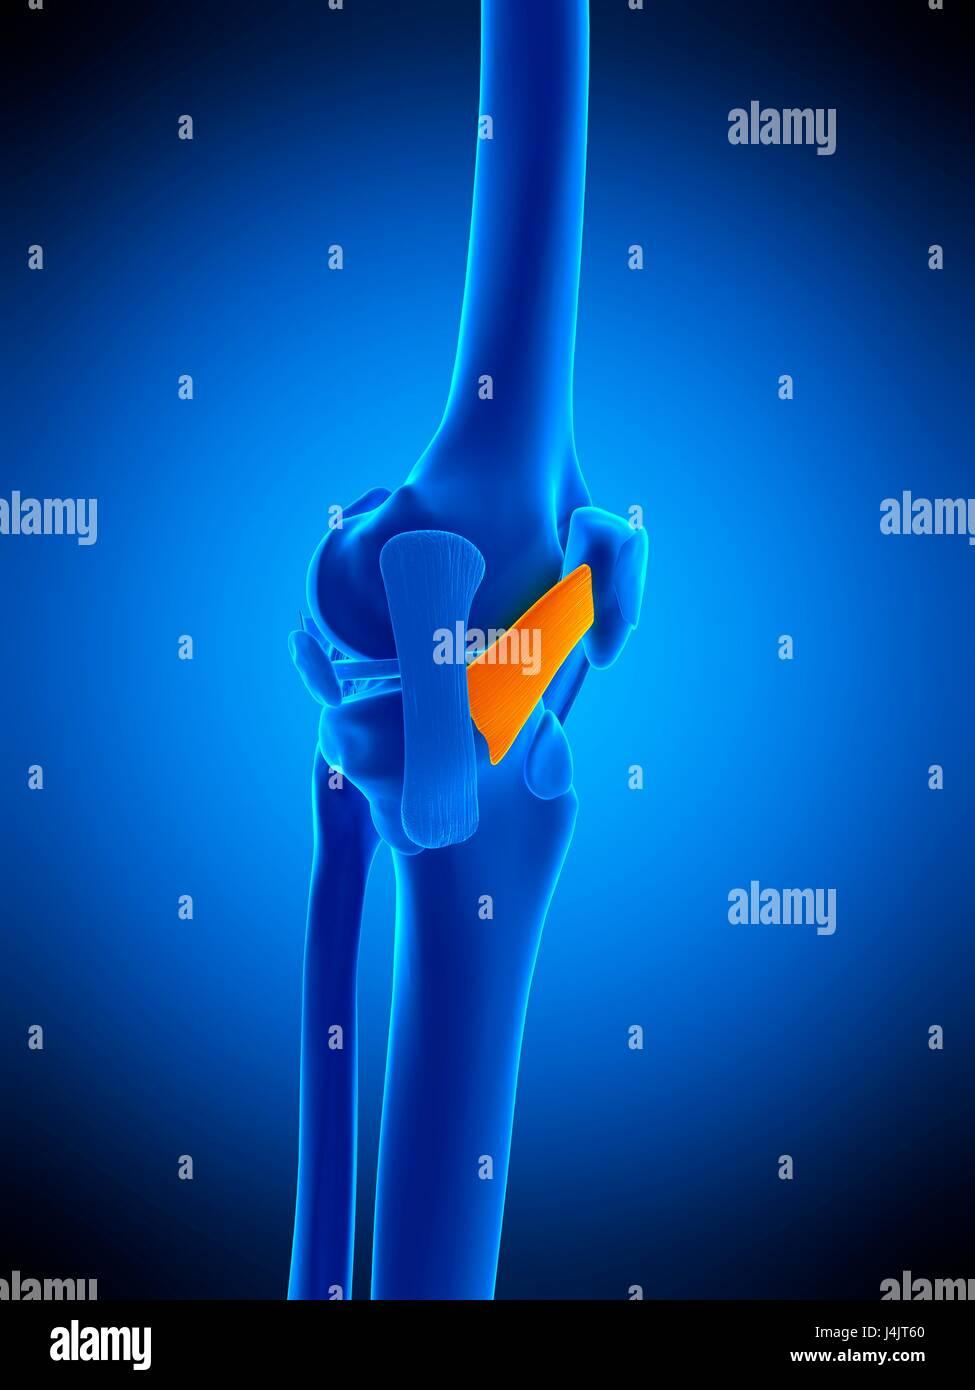 Illustration Of The Medial Patellar Ligament Stock Photo 140555688